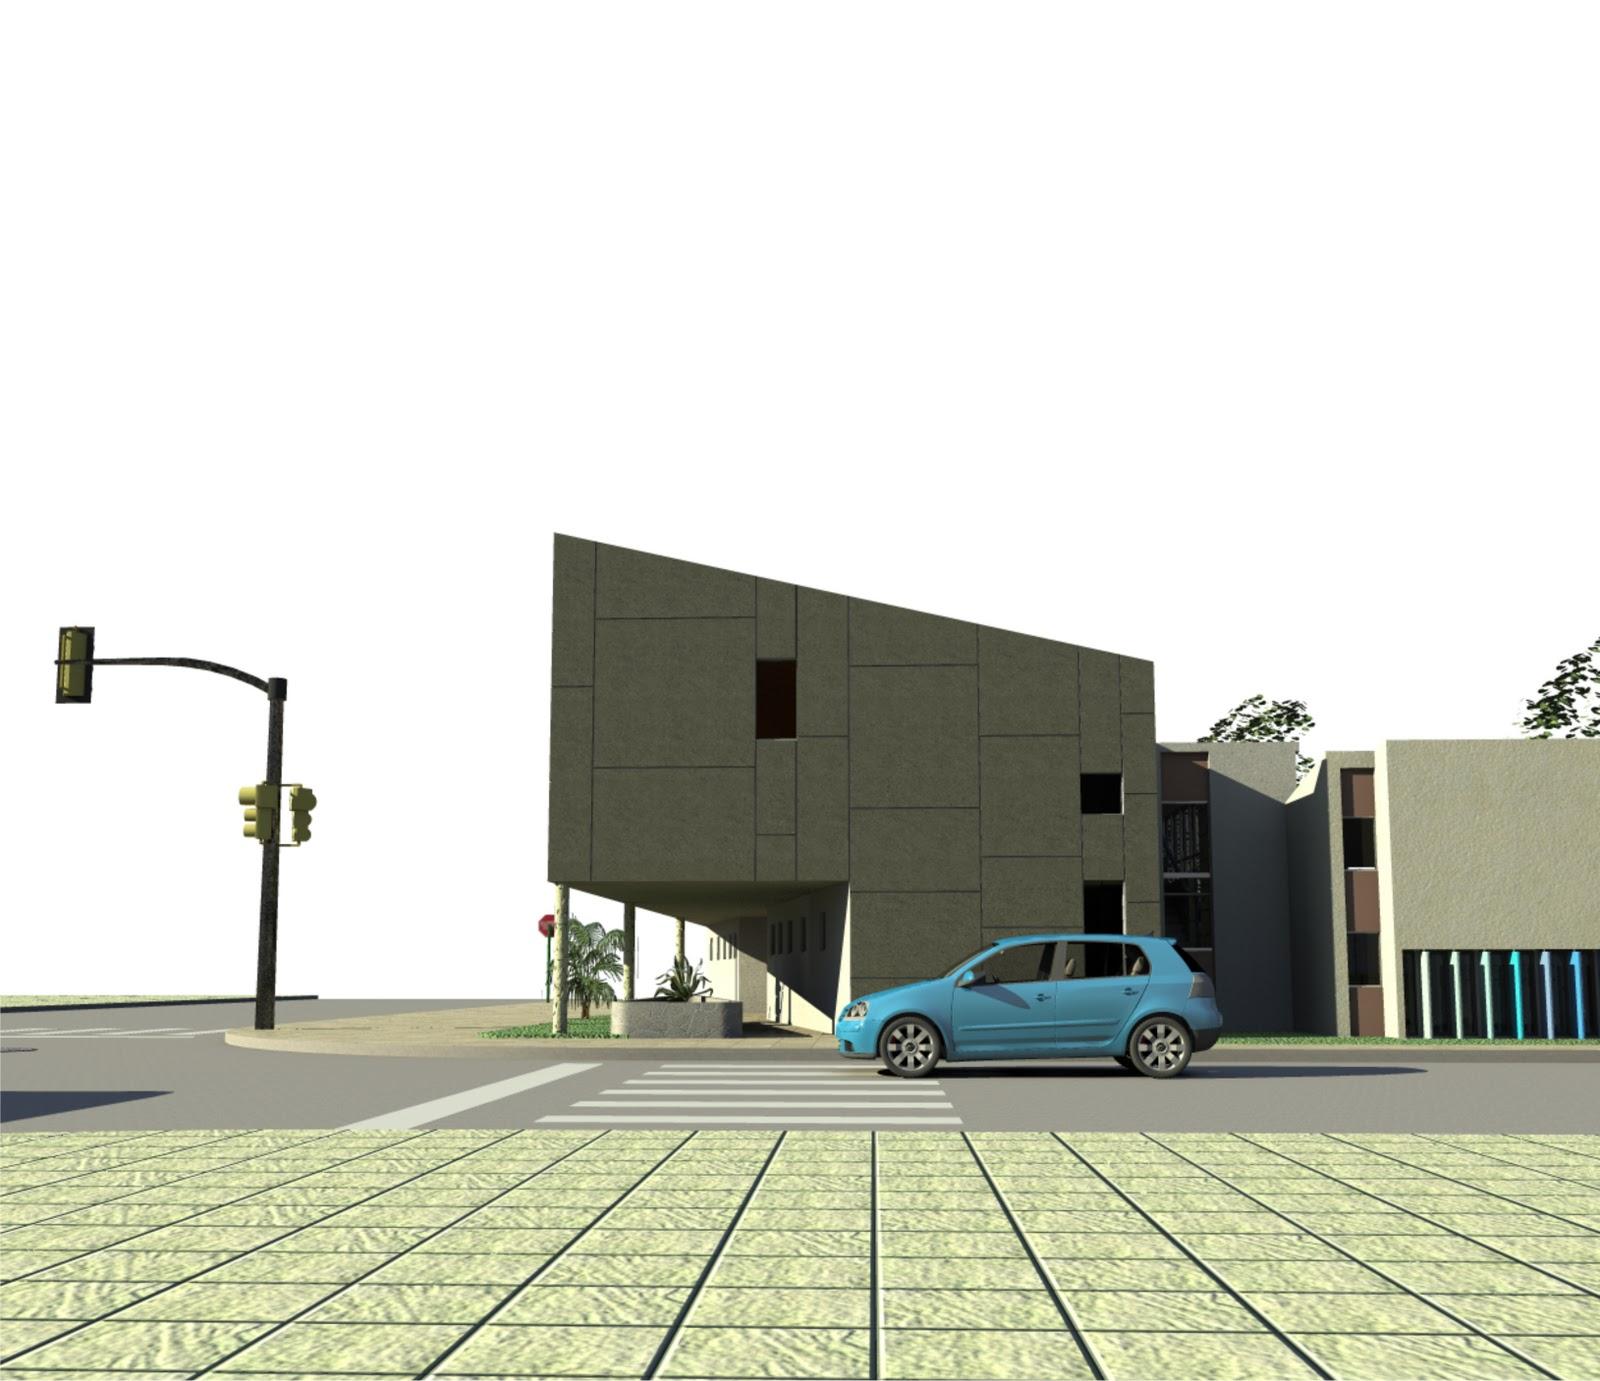 Arquitectura proyecto mar del plata equipamiento urbano for Equipamiento urbano arquitectura pdf